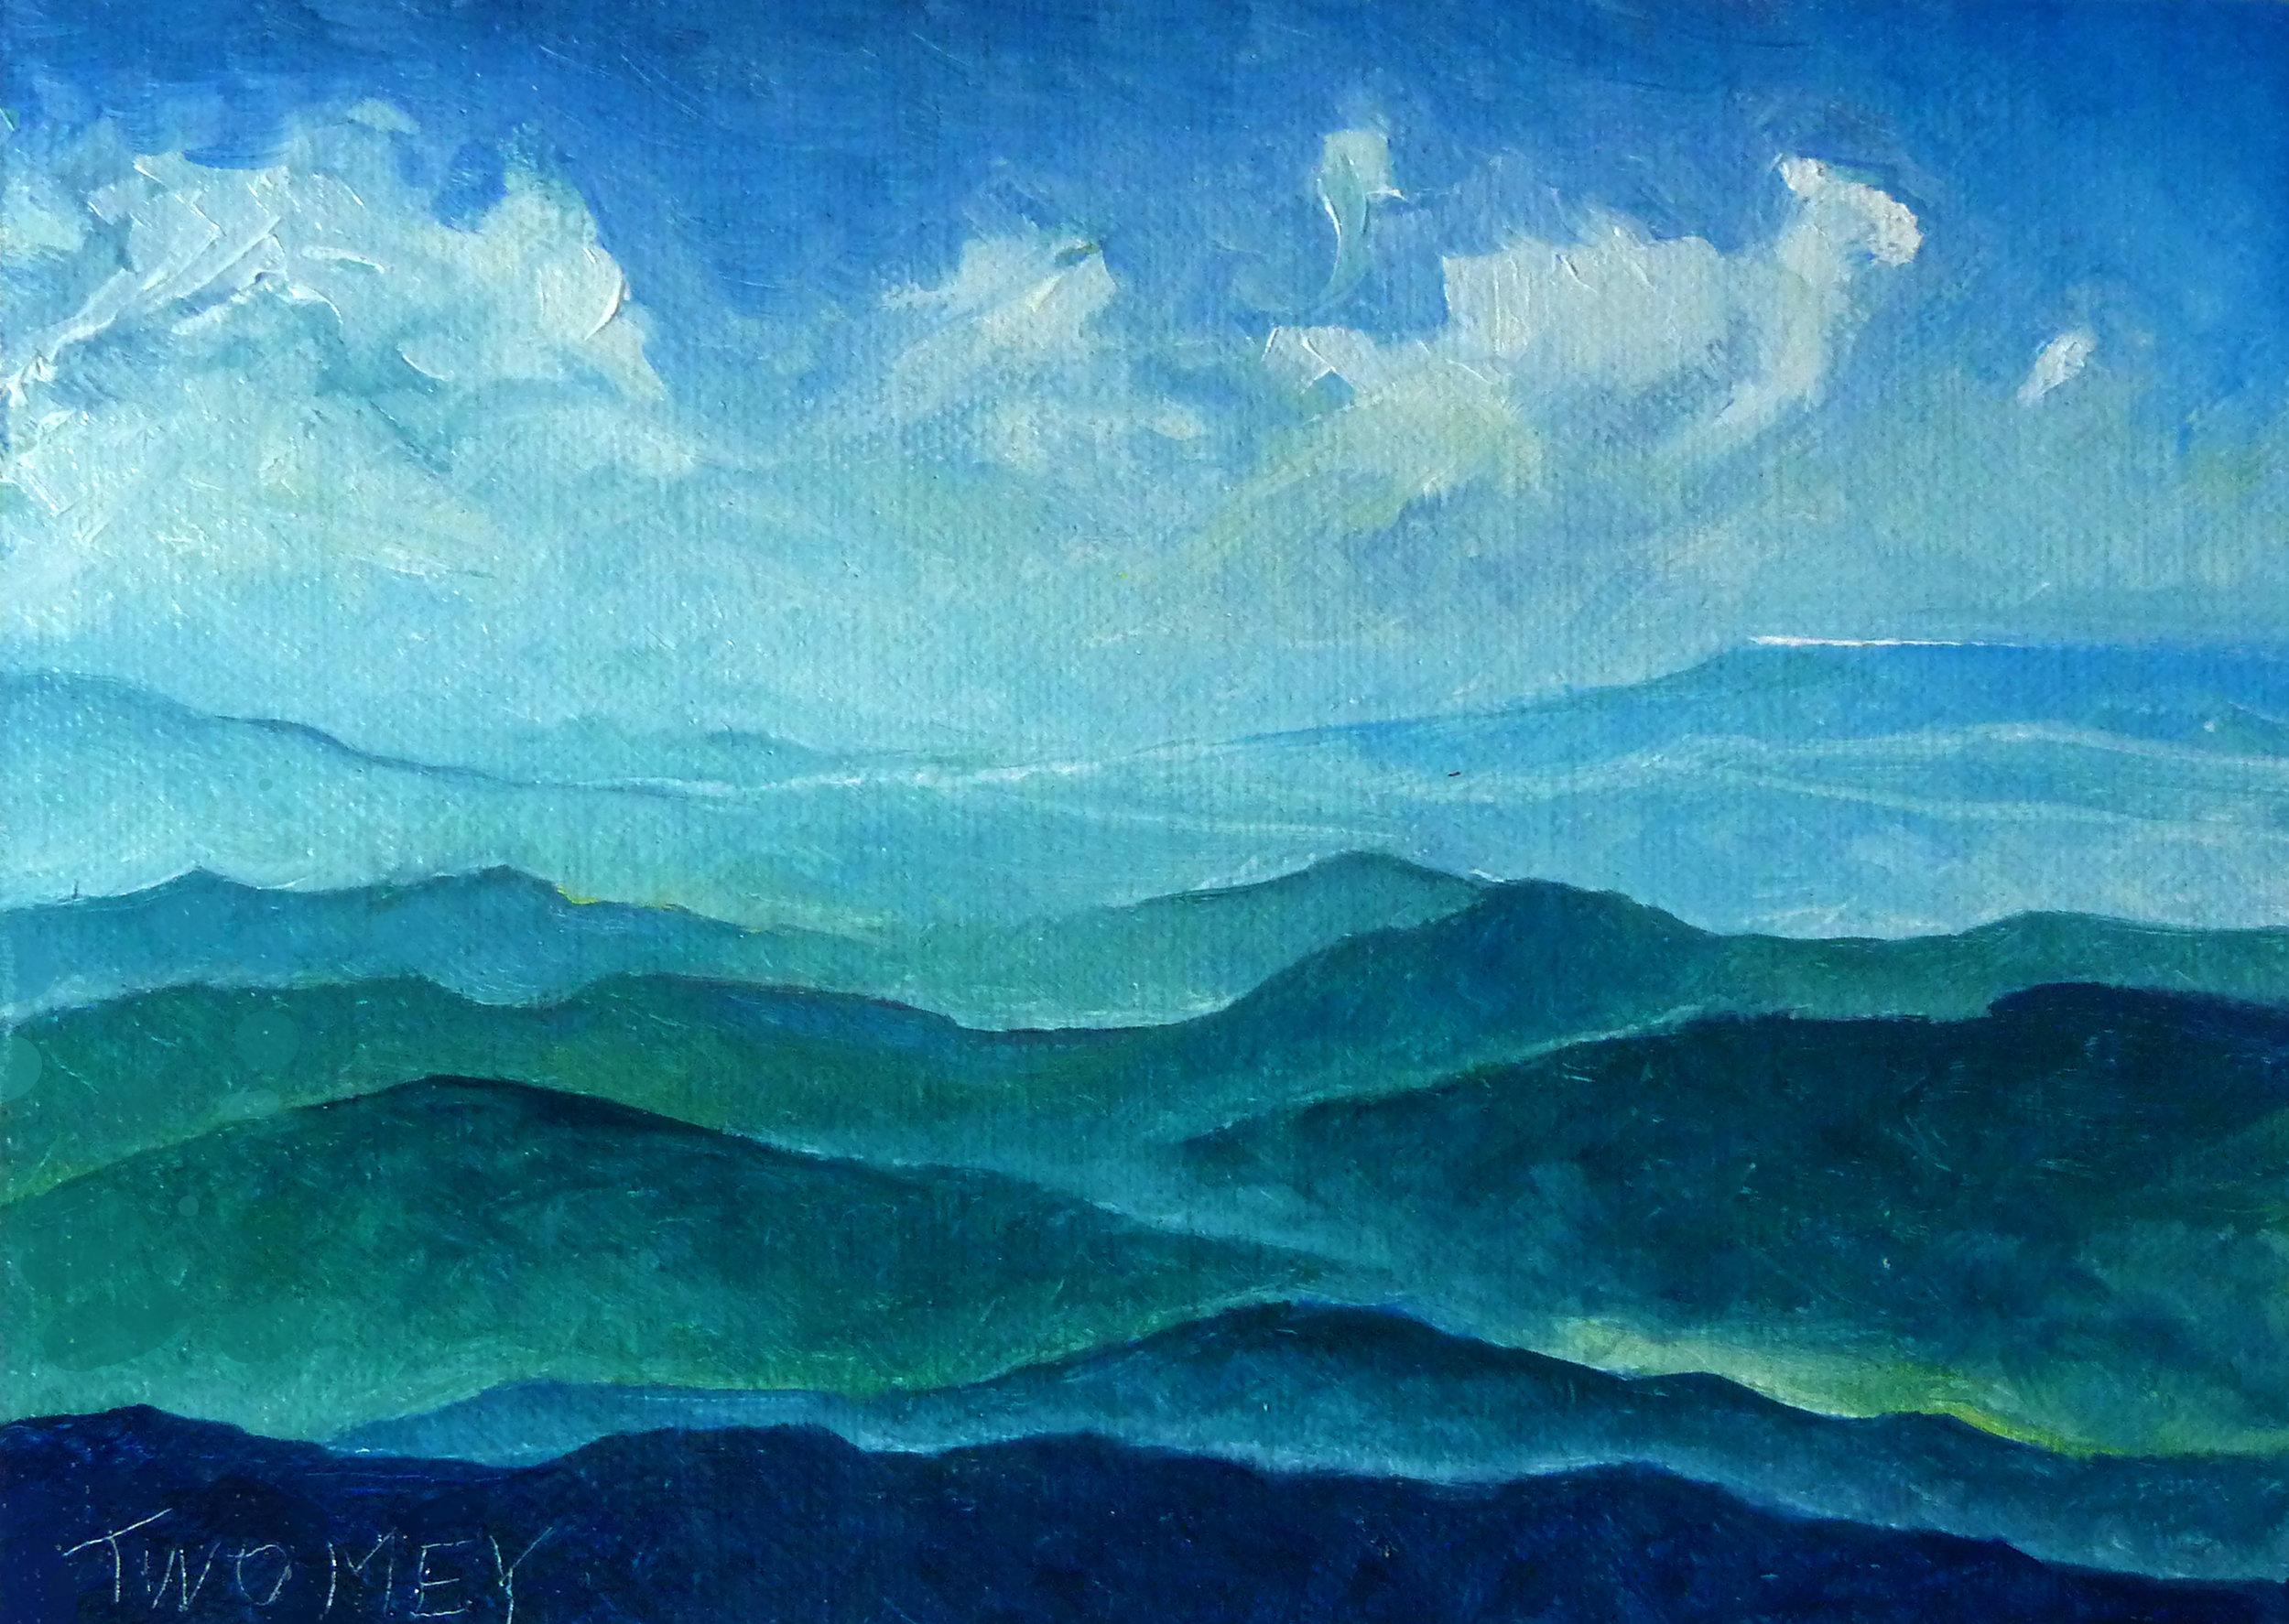 """Blue Ridge Blue Sheep Cloud"", C. Twomey,"